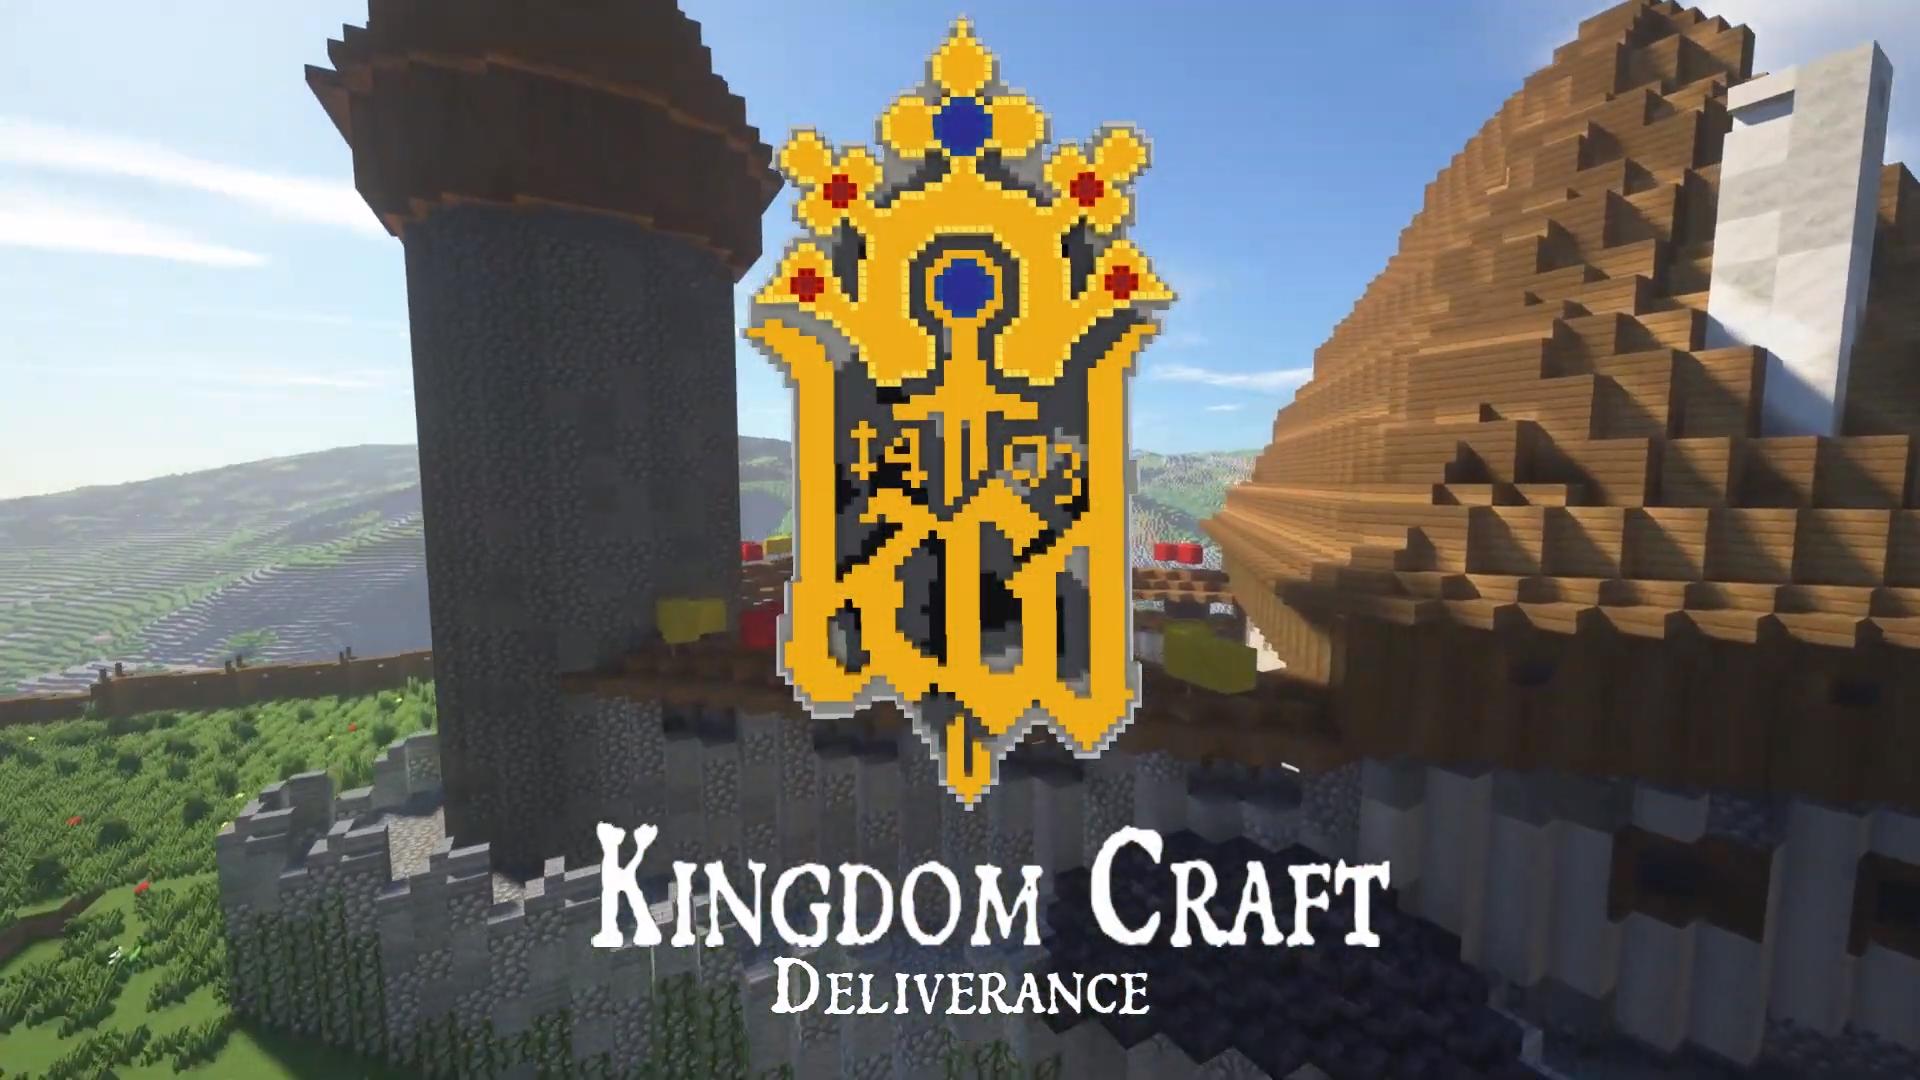 https://xgm.guru/p/go/CHego-esche-ne-bylo-v-Minecraft-Kingdom-Come-Deliv